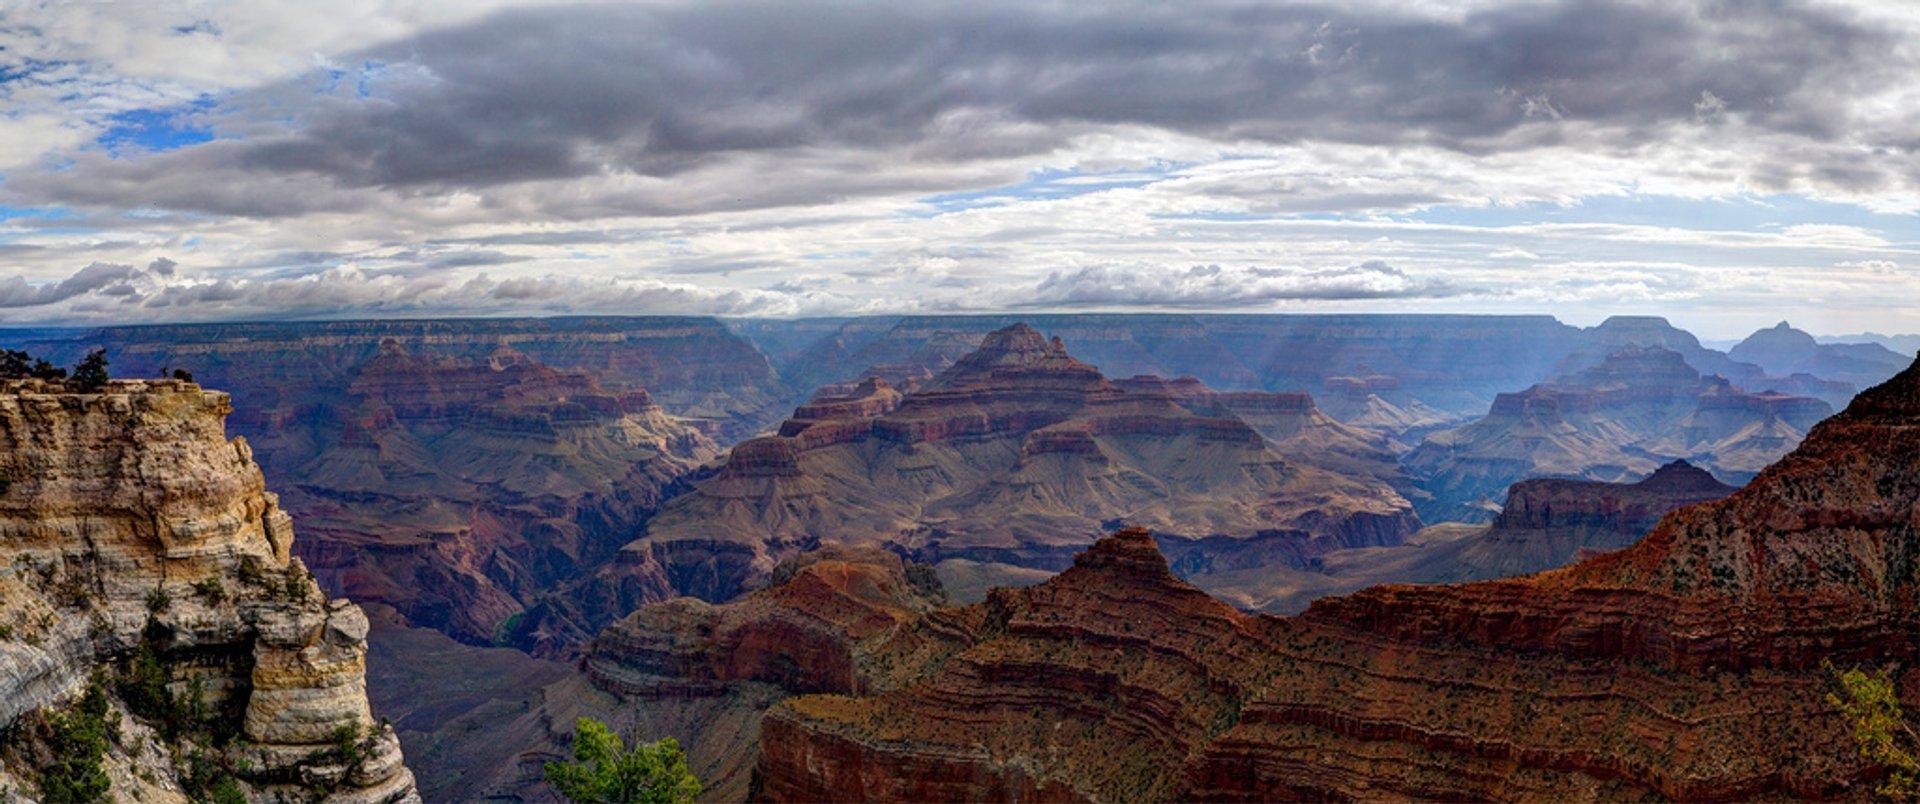 Monsoon Season in Grand Canyon - Best Season 2019